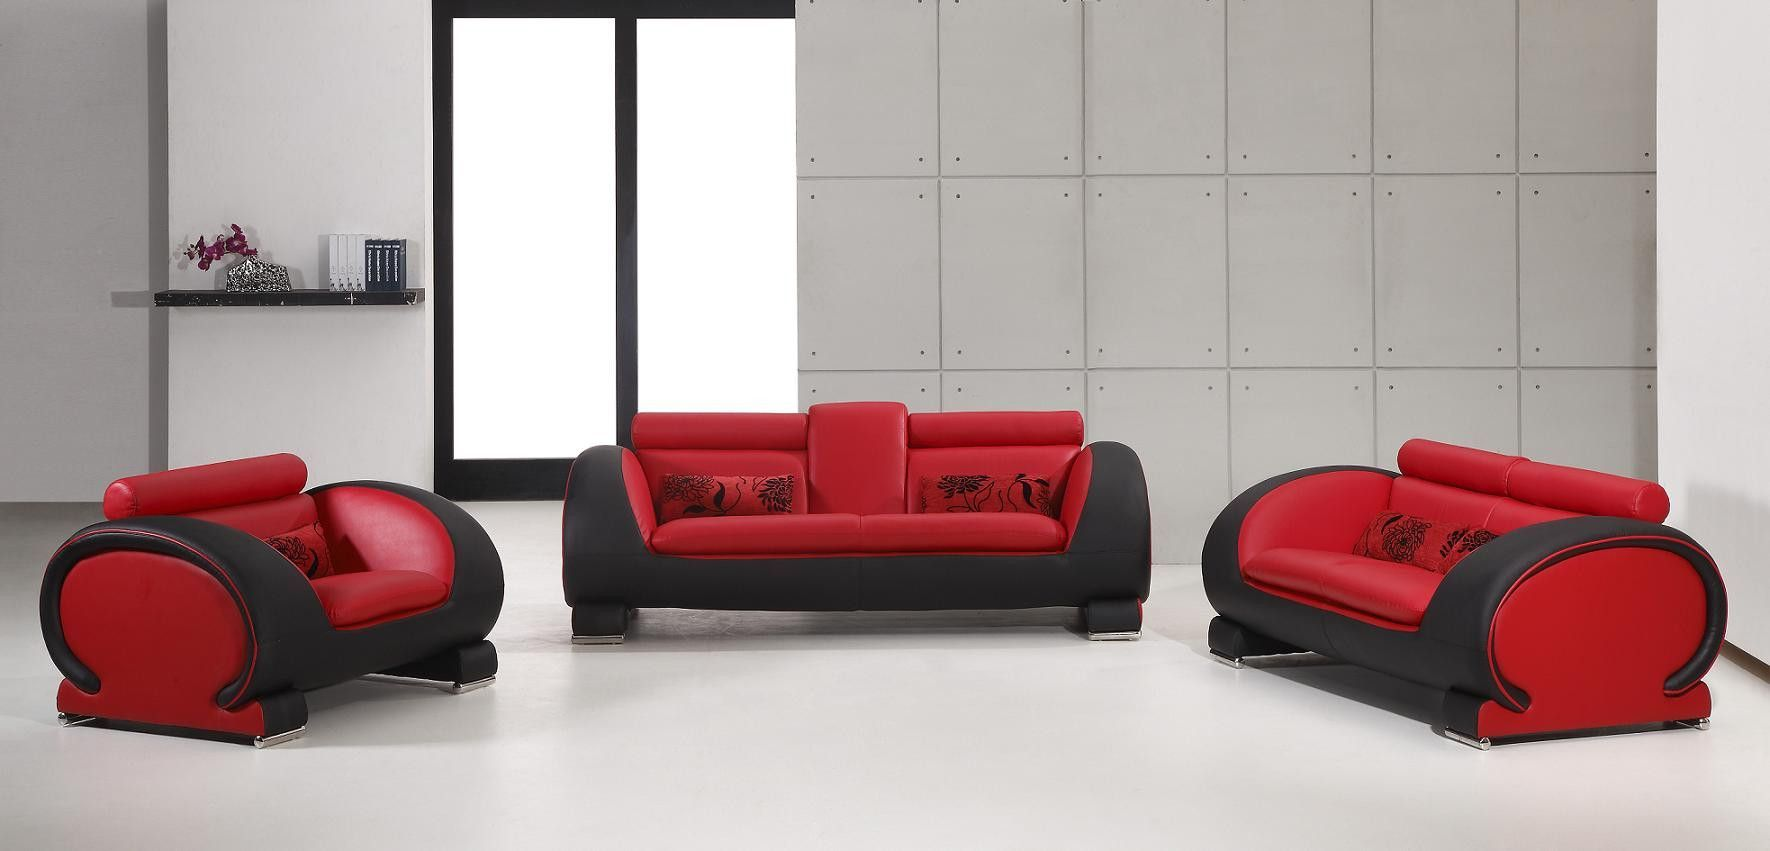 Divani Casa 2811 - Modern Bonded Leather Sofa Set | Game room ...